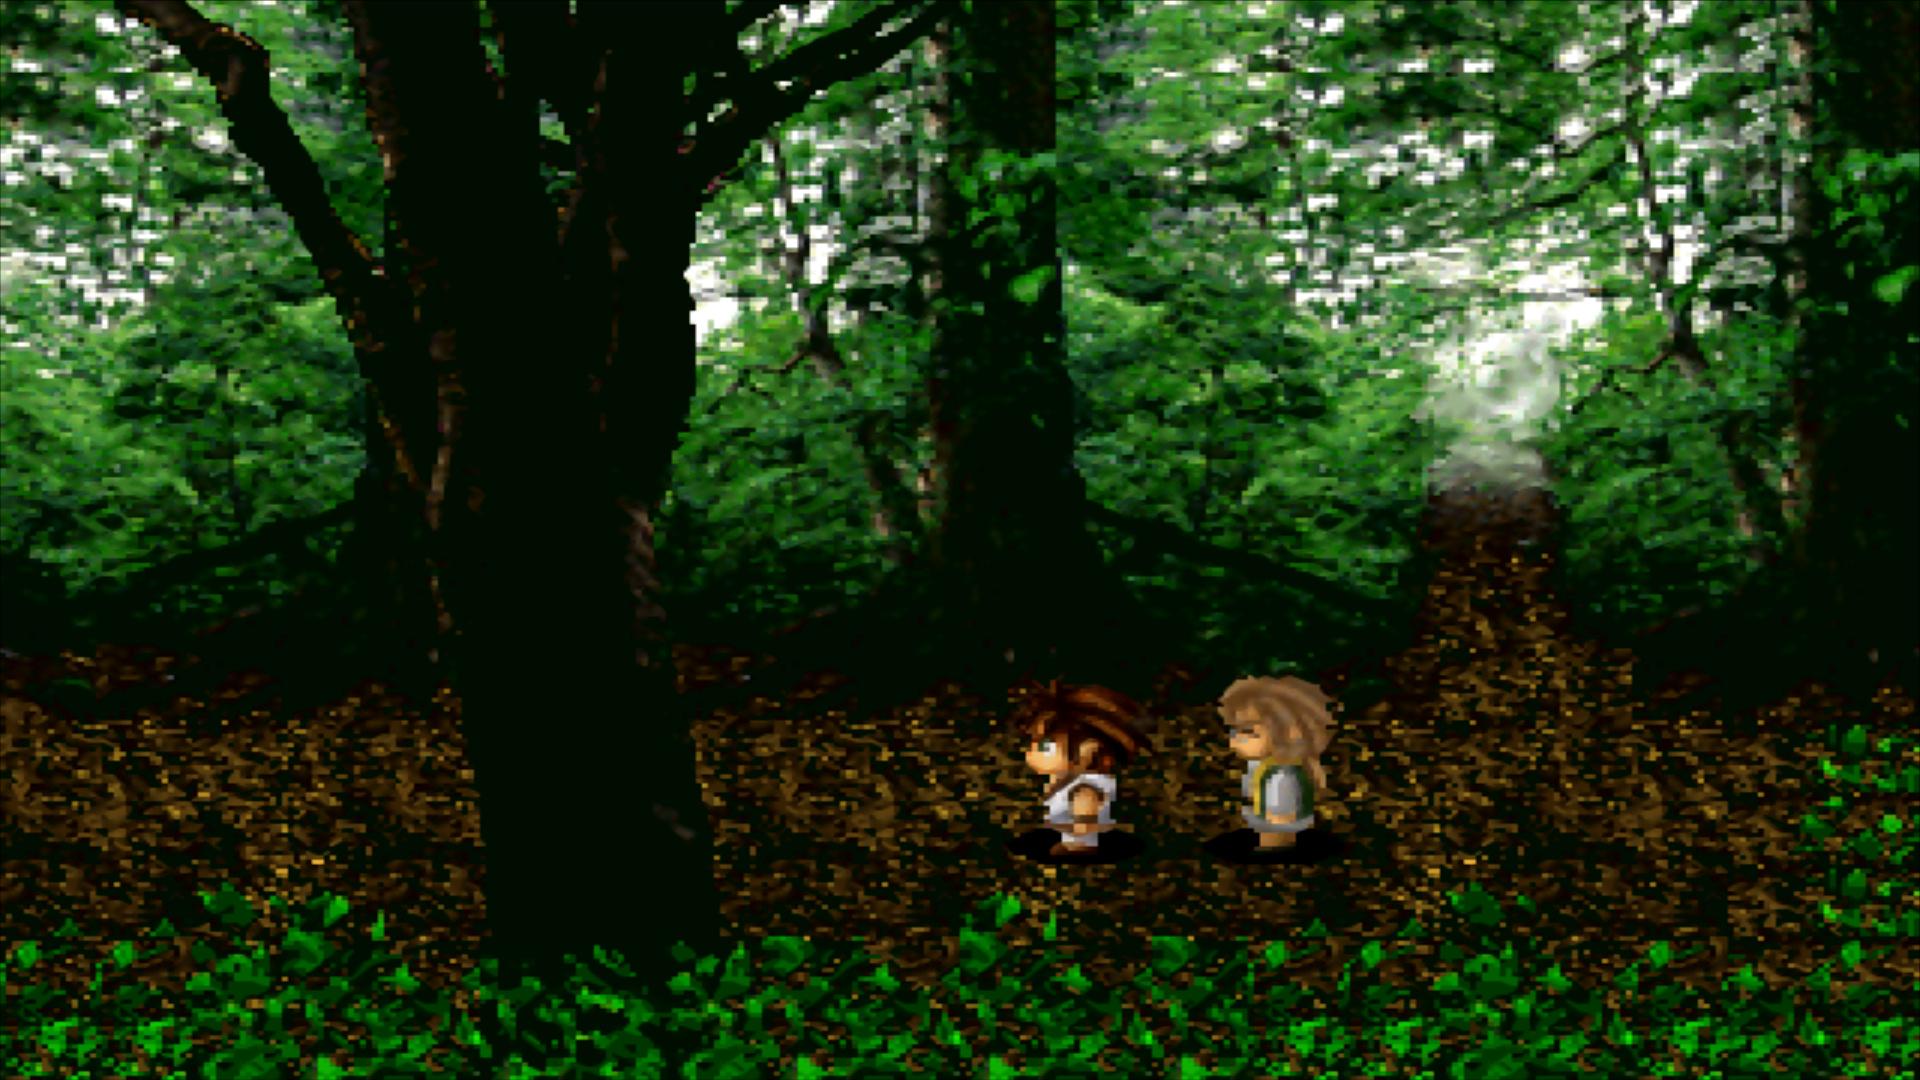 Blue Forest Story (4).jpg - -